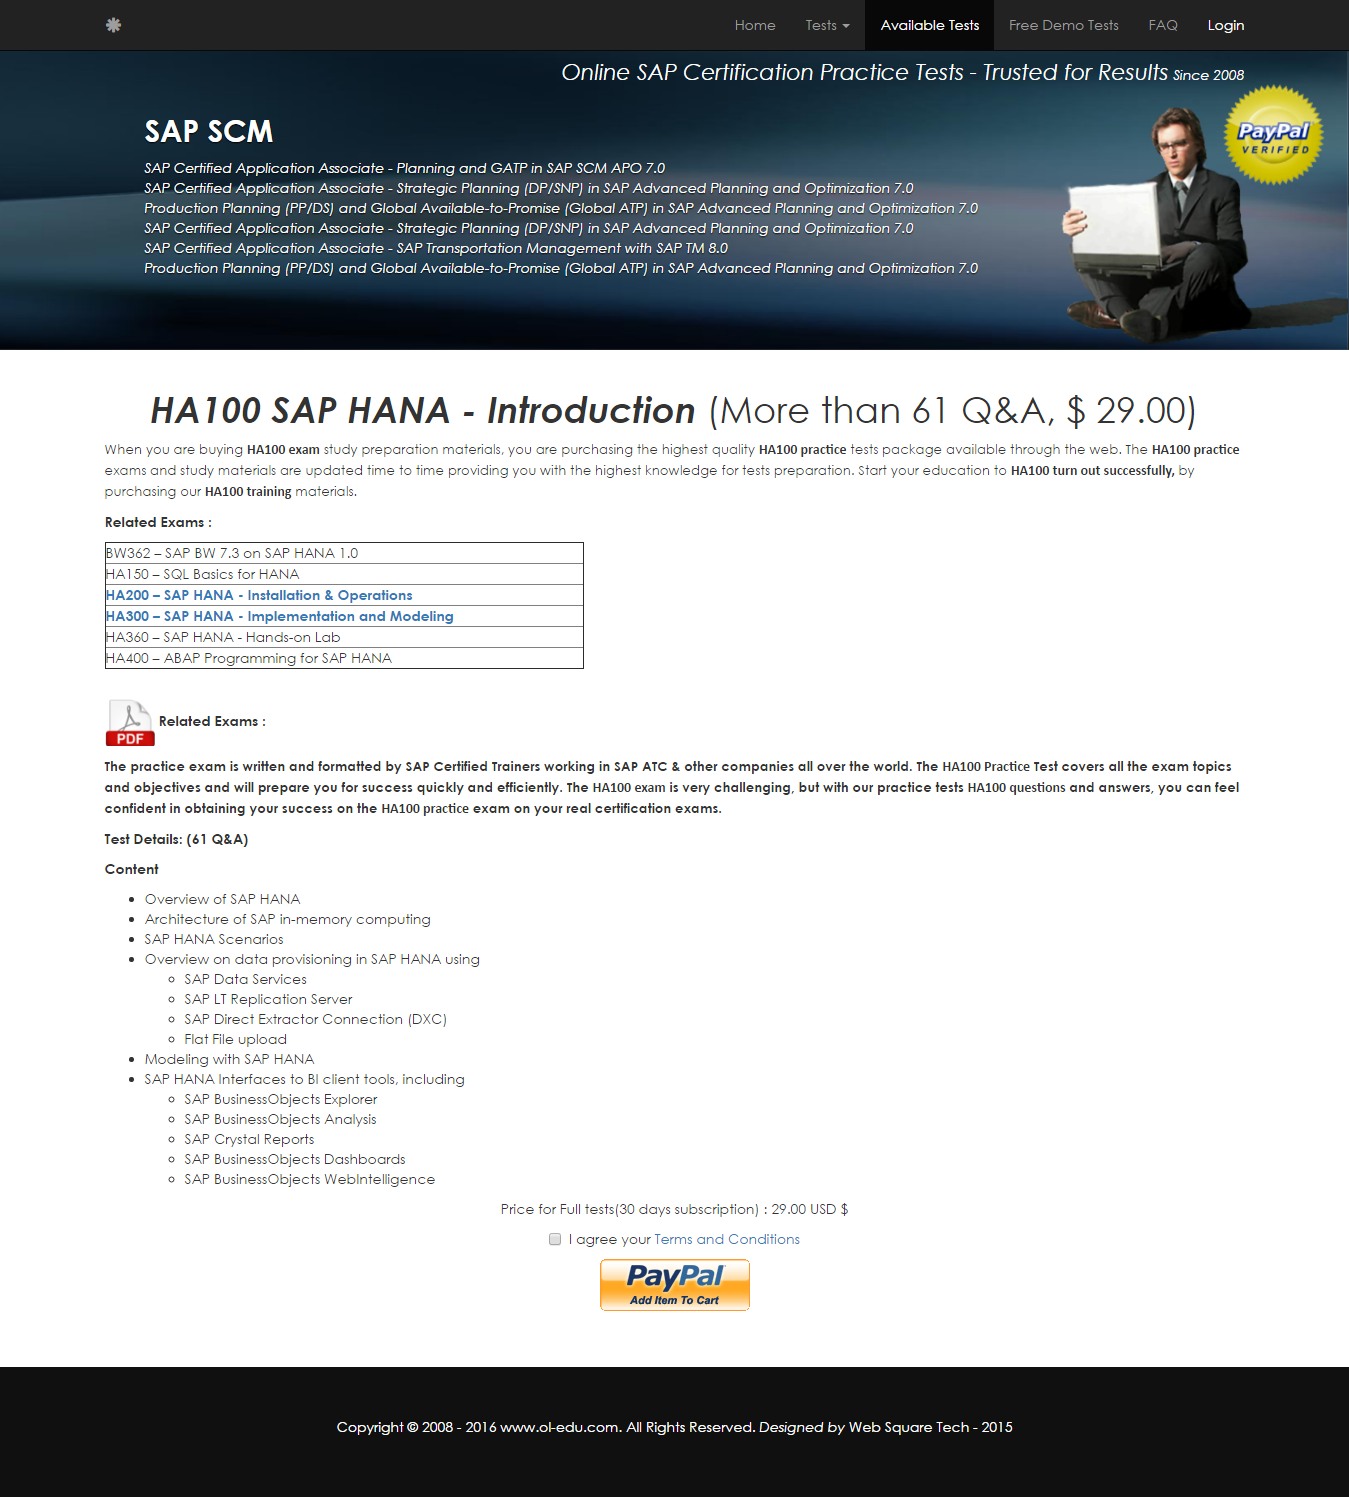 Ha100 Sap Hana Introduction Sap Certification Questions And